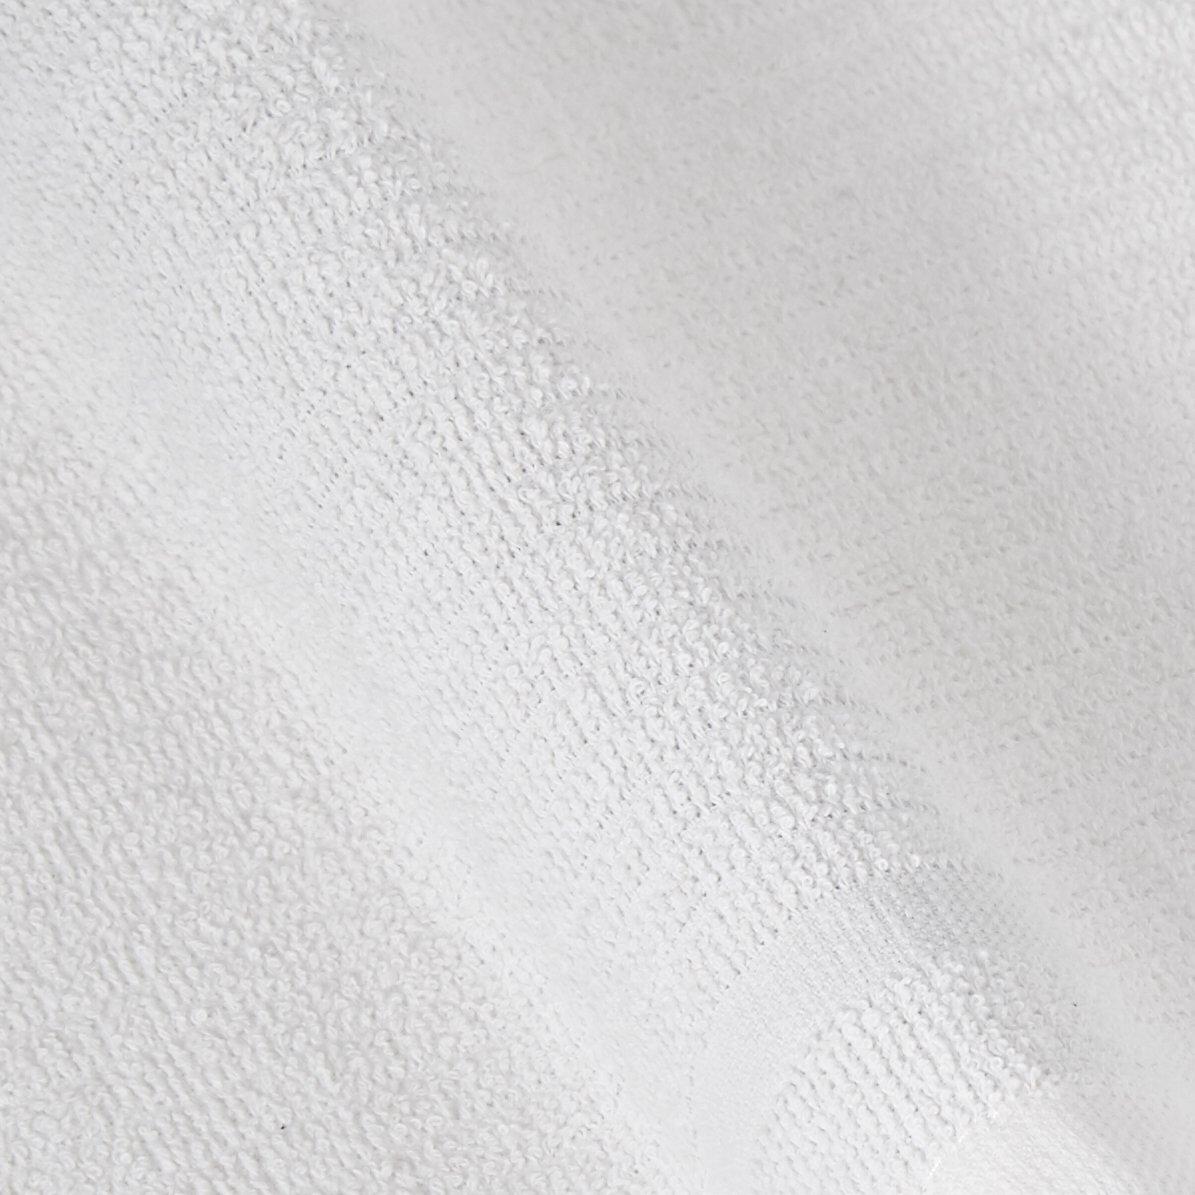 Kay Dee diseños Toallas de Bar Gamuza de (Juego de 4): Amazon.es: Hogar